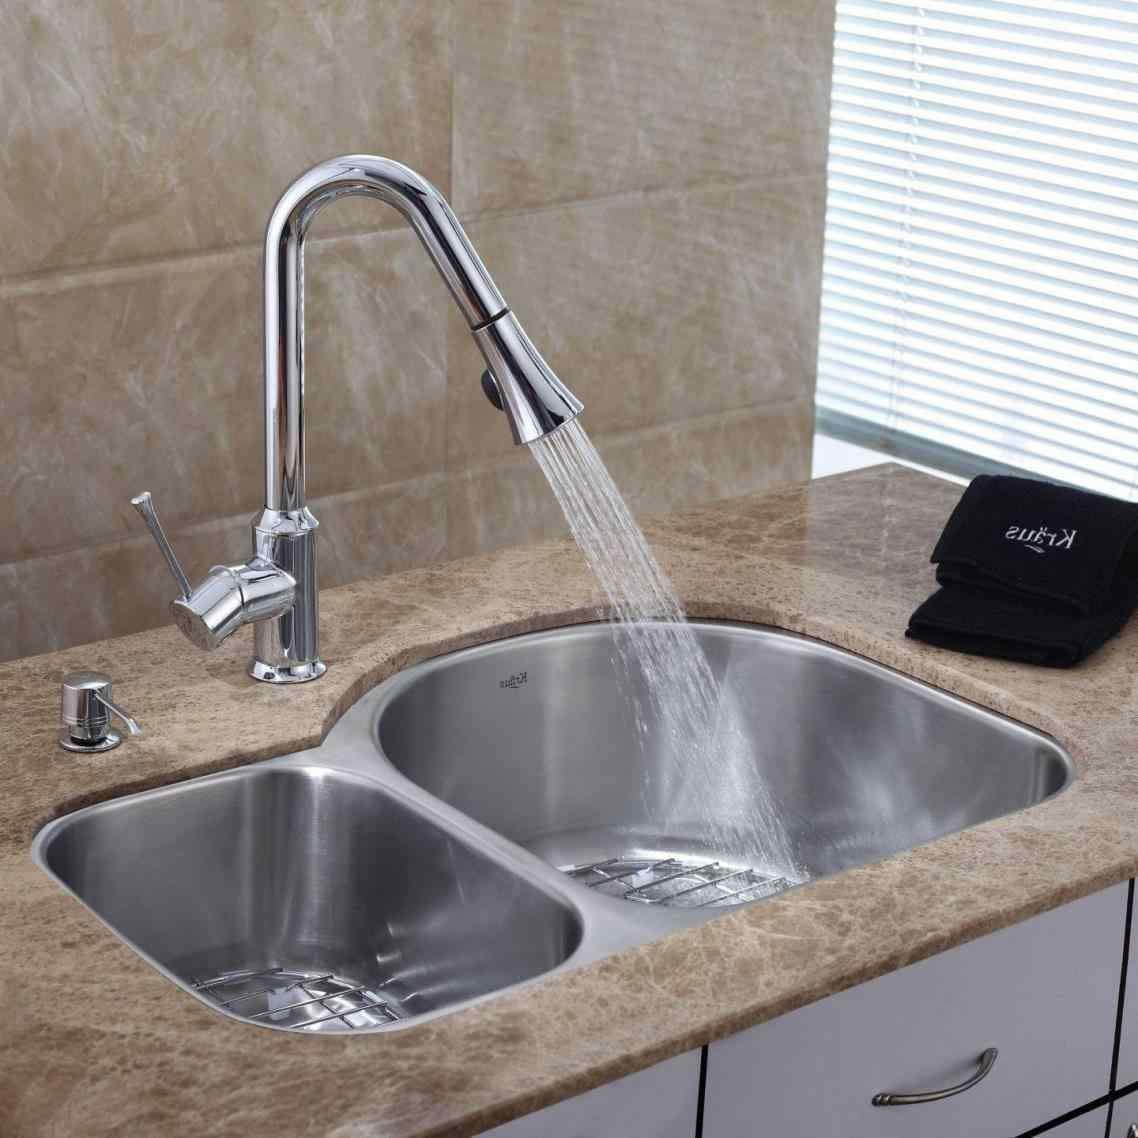 Farmhouse Sink Mat Farmhouse Sink Ideas Kitchen Sink Sink Design